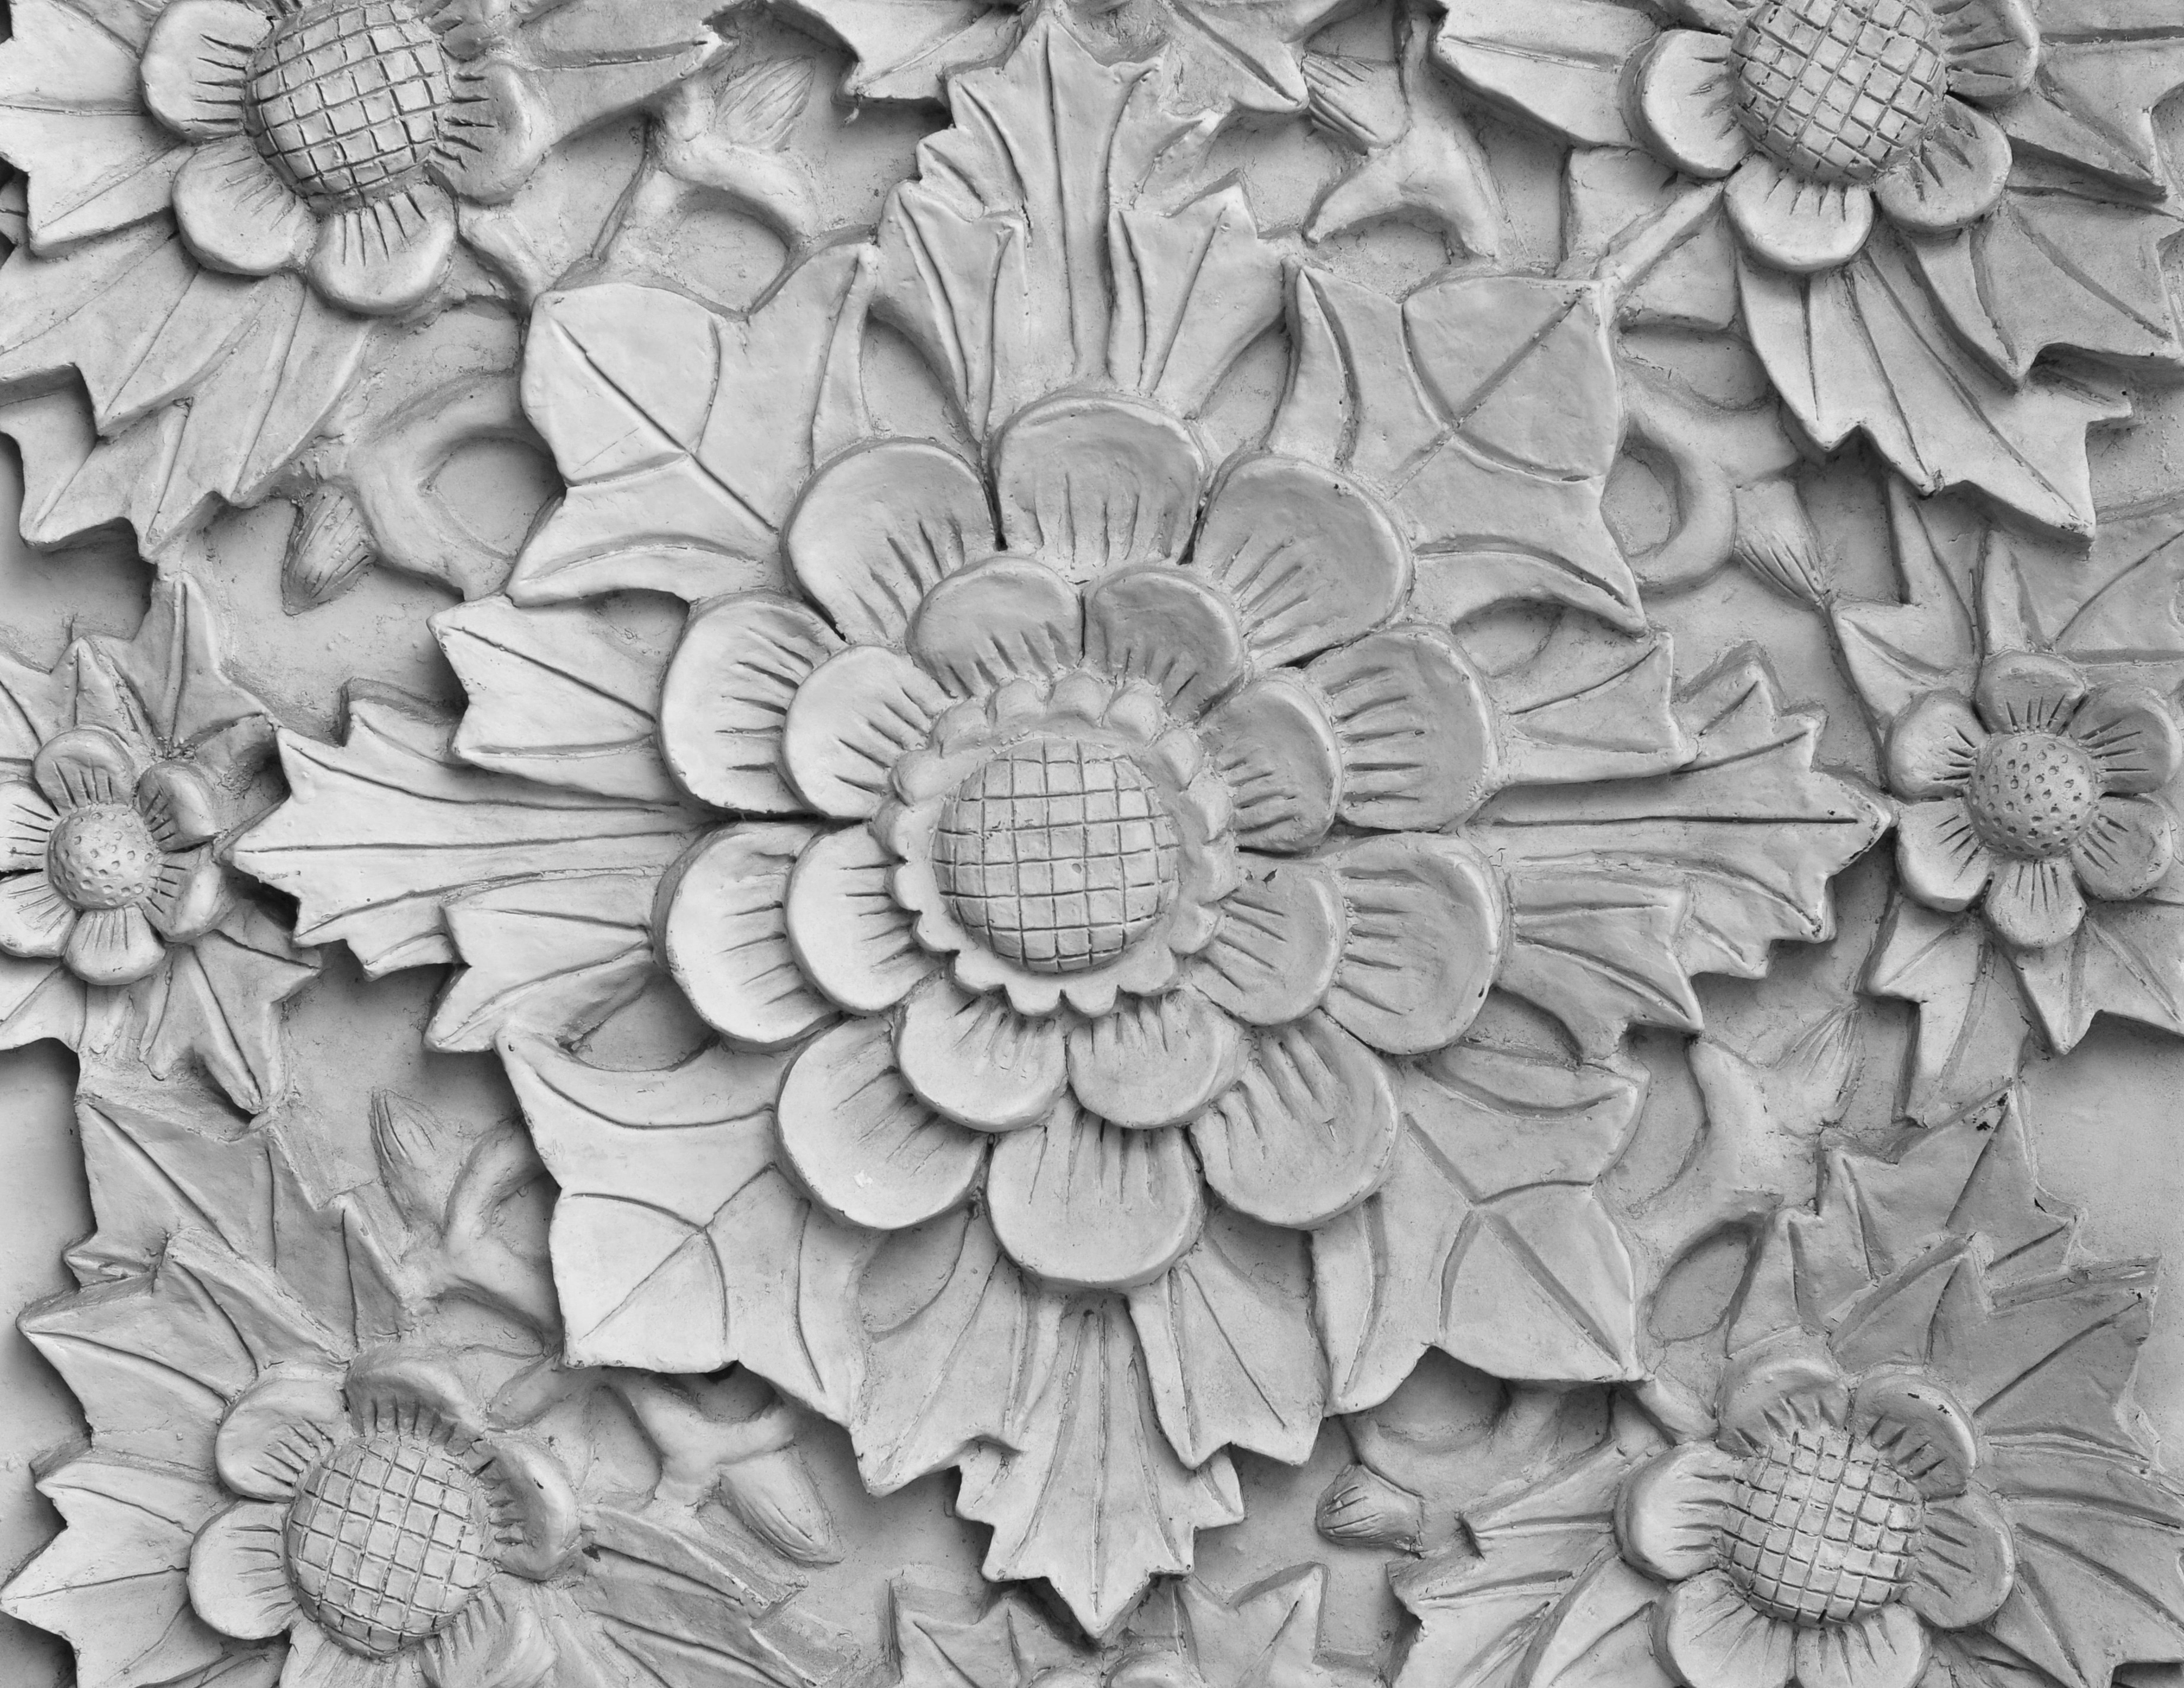 Free Images Black And White Flower Petal Pattern Botany Decor